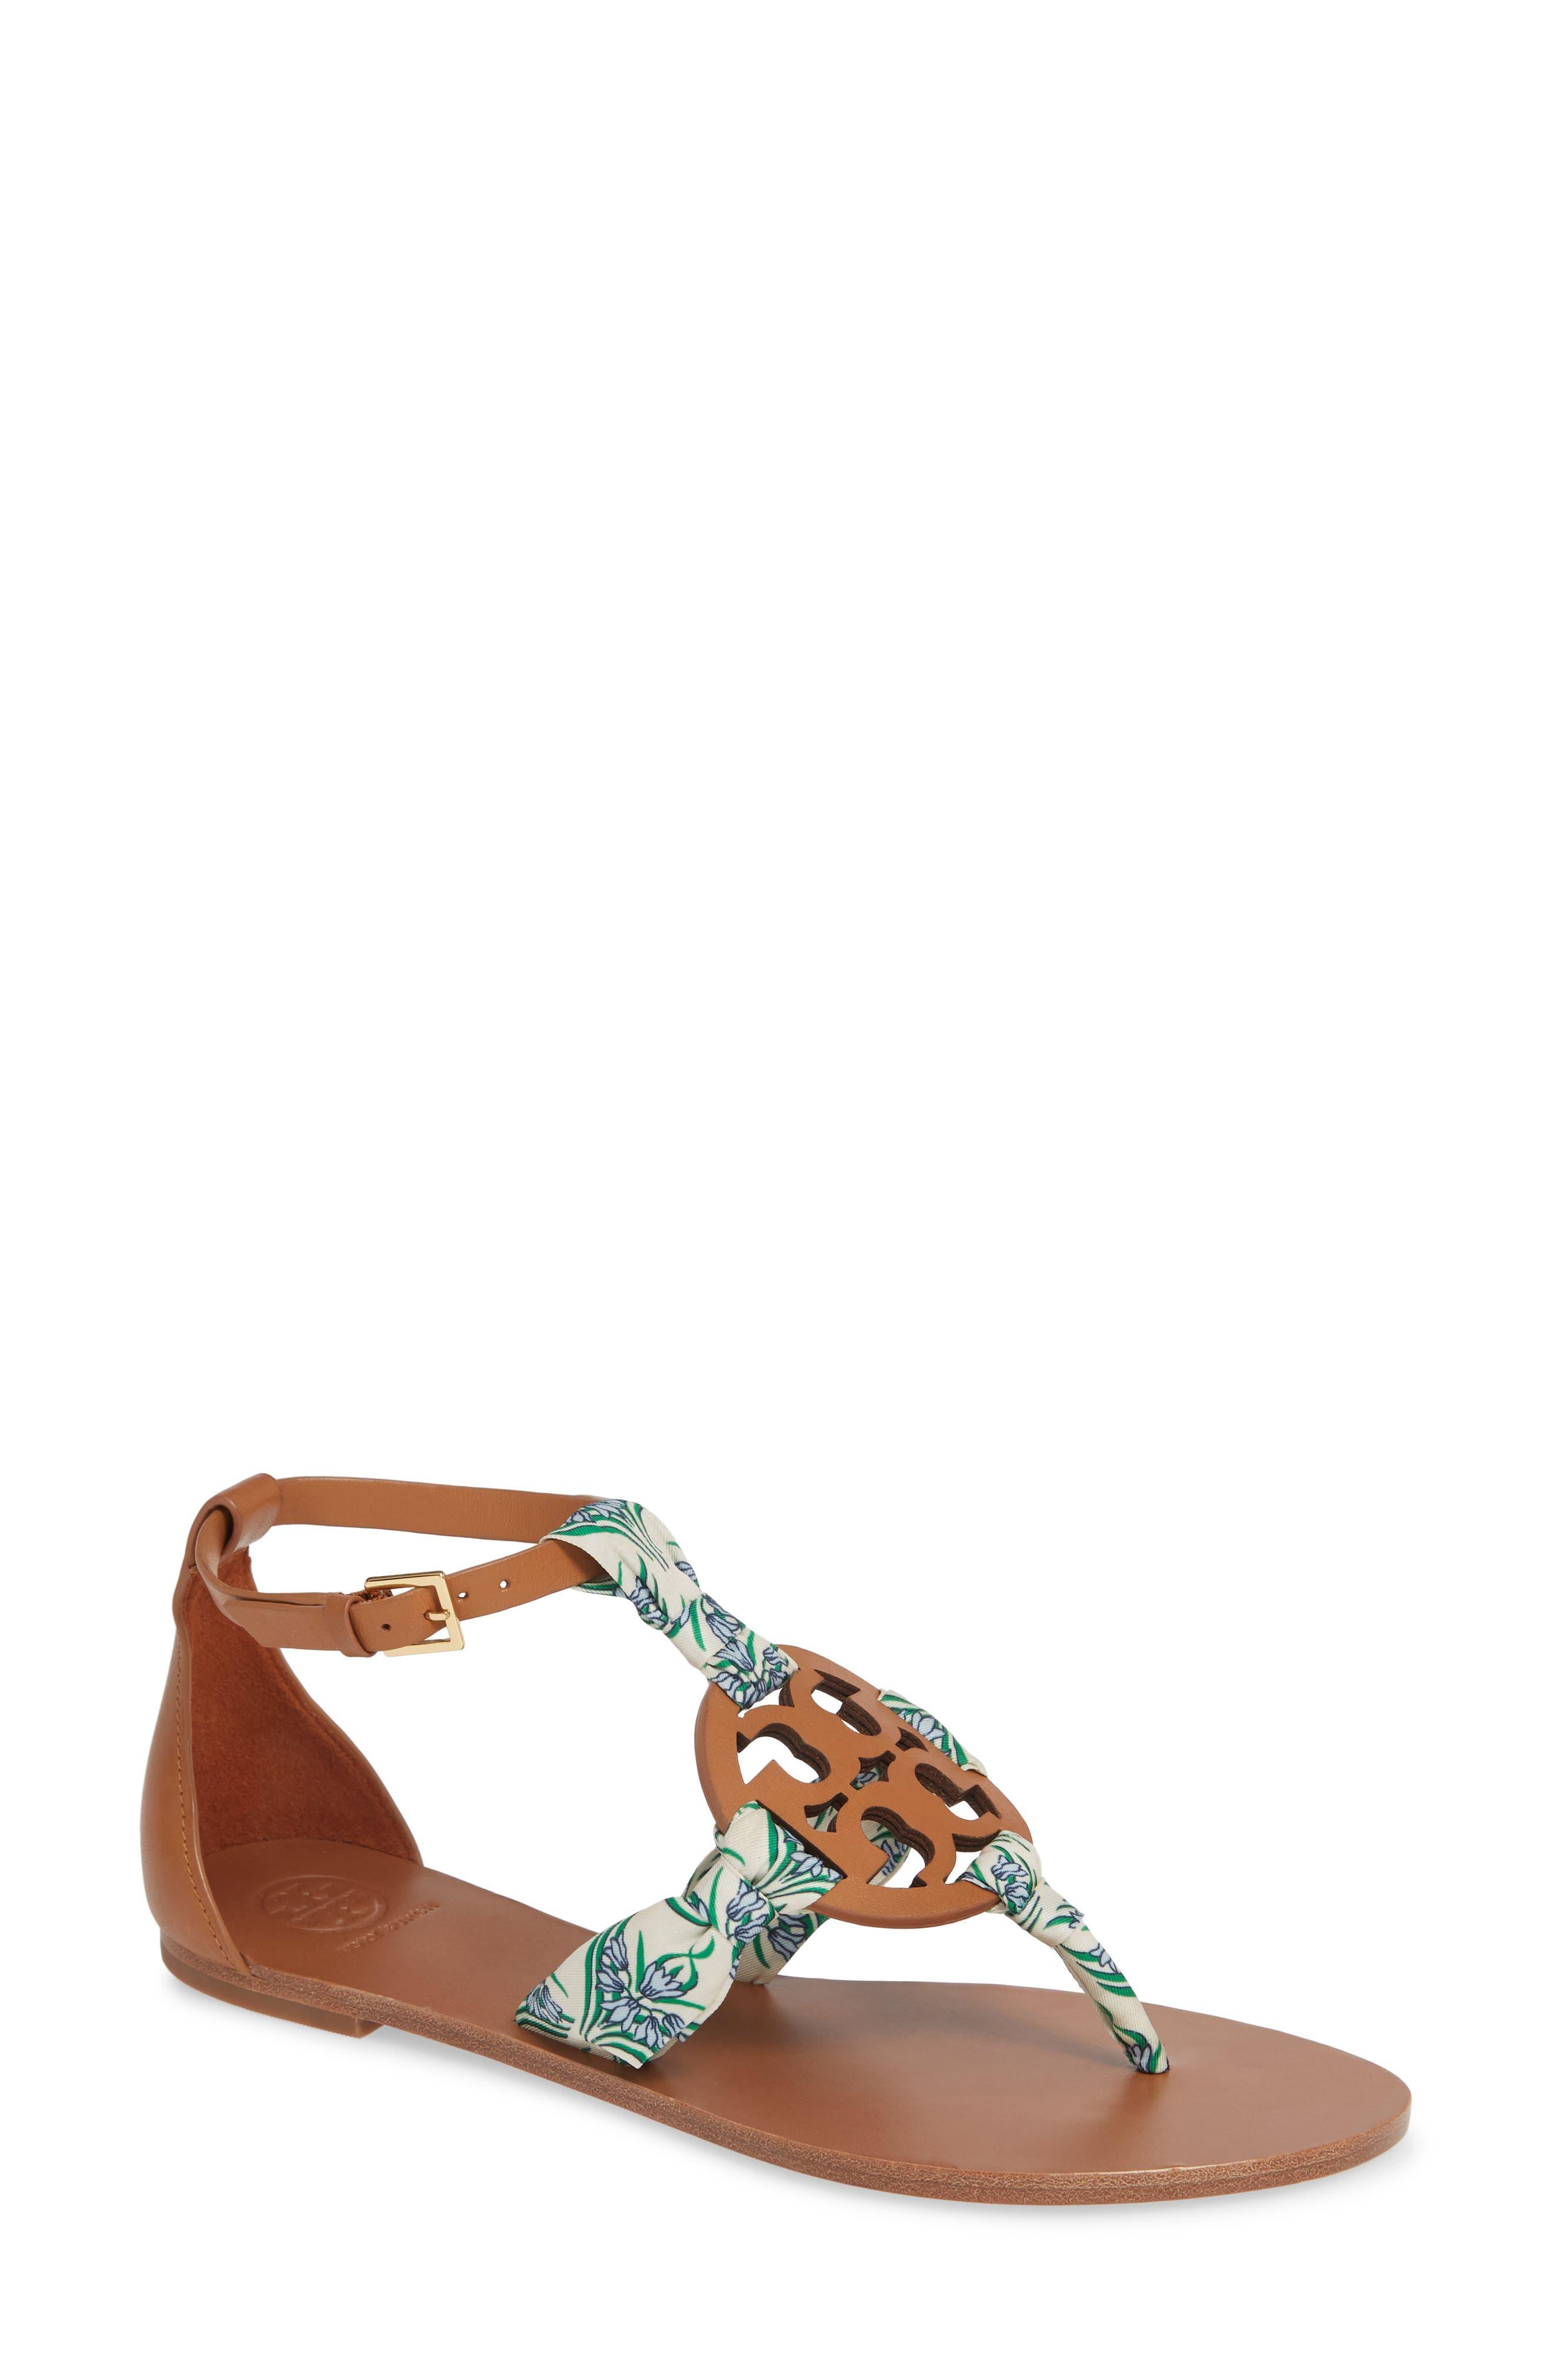 Miller Scarf Sandal, Main, color, TAN/ BLUE MERIDIAN